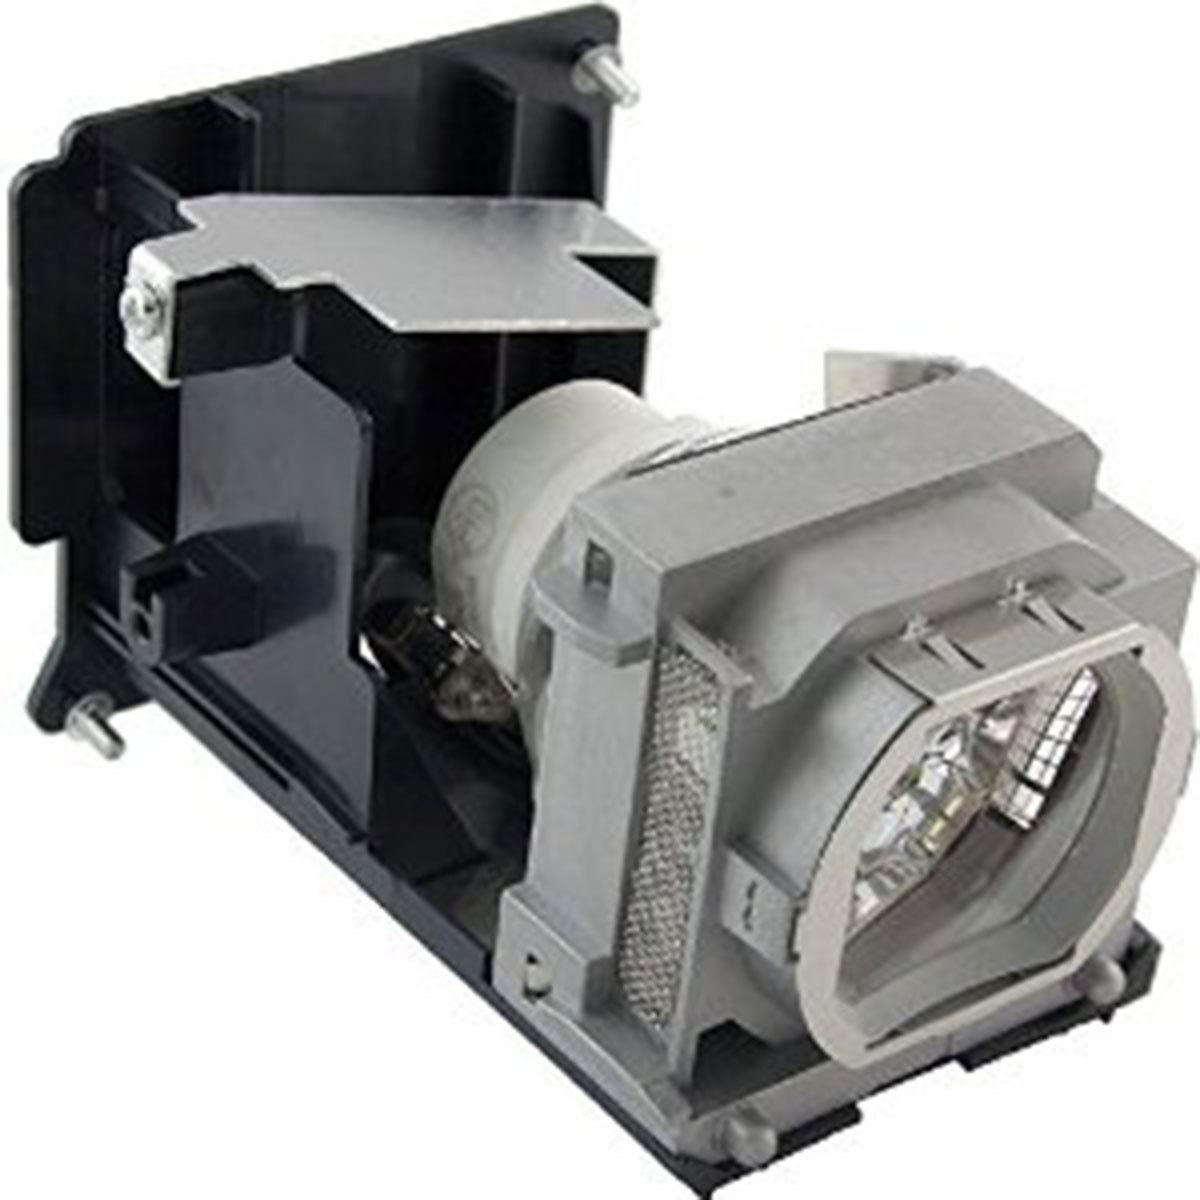 VLT-HC6800LP HC6800LP VLTHC6800LP for Mitsubishi HC6800 HC6800U Projector Lamp Bulb with housing replacement lamp bulb with housing vlt xd206lp for md307x md307s xd206u sd206u sd206